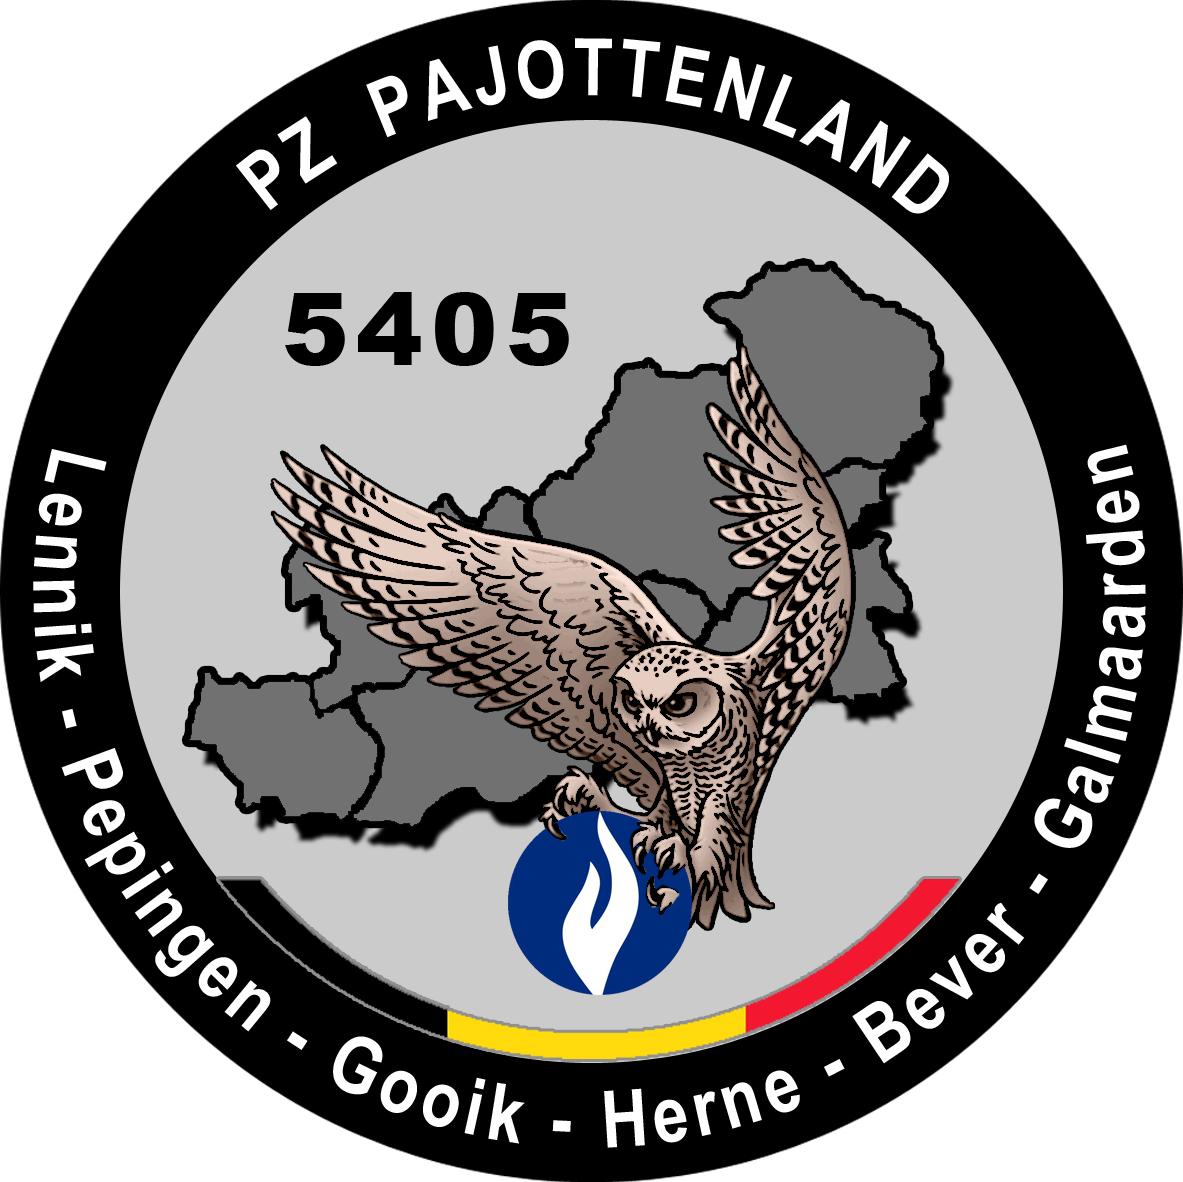 Lokale Politie Pajottenland